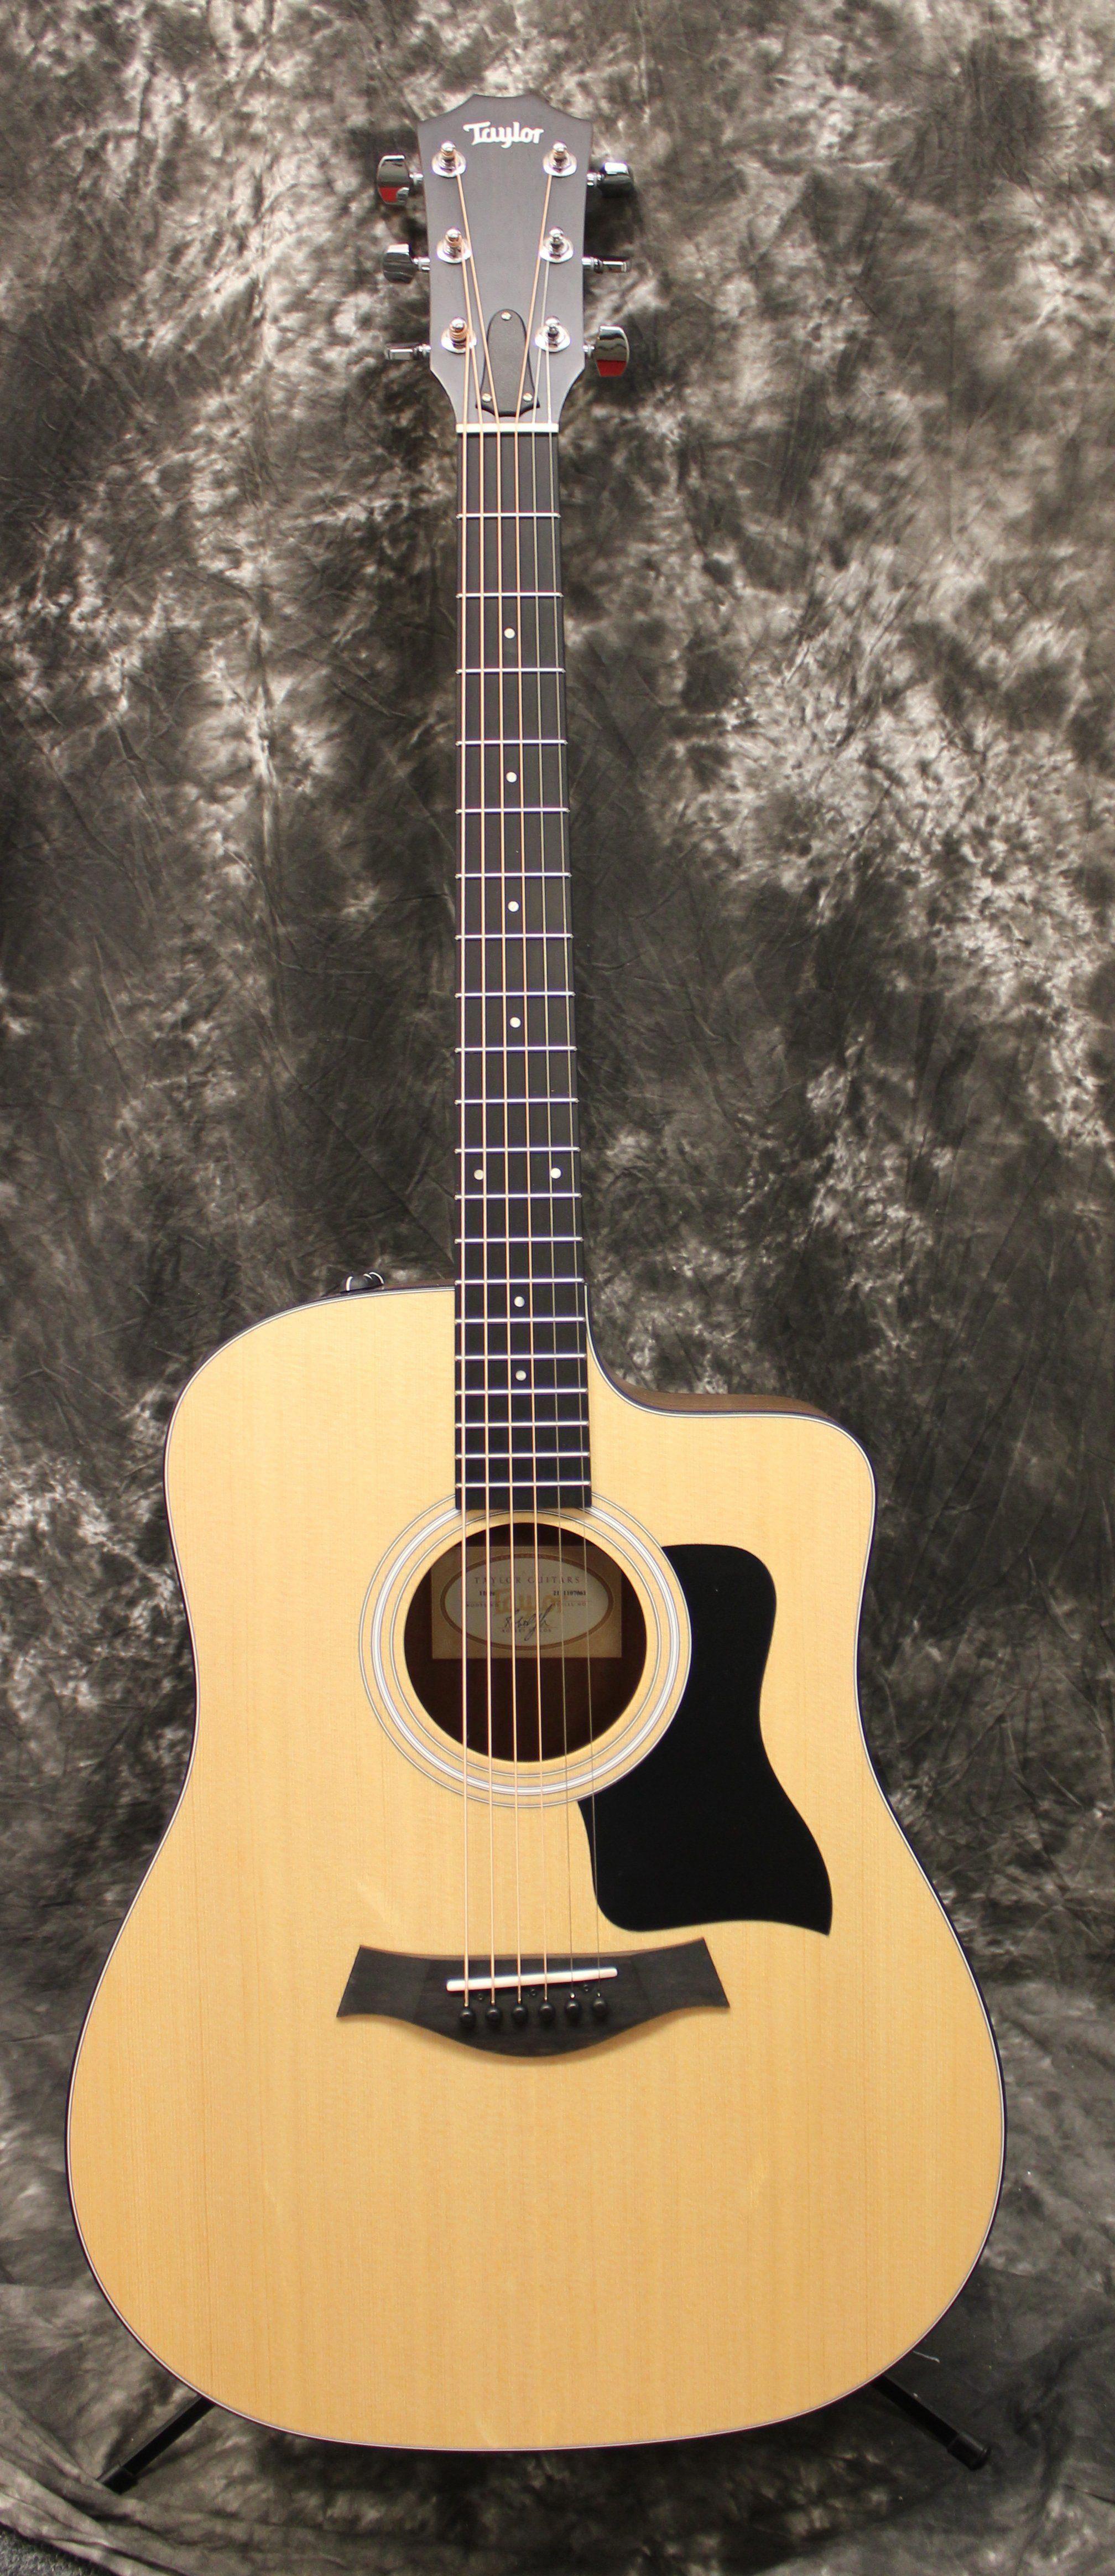 Cool Taylor Acoustic Guitars 5507 Tayloracousticguitars Acoustic Guitar Acoustic Electric Guitar Guitar